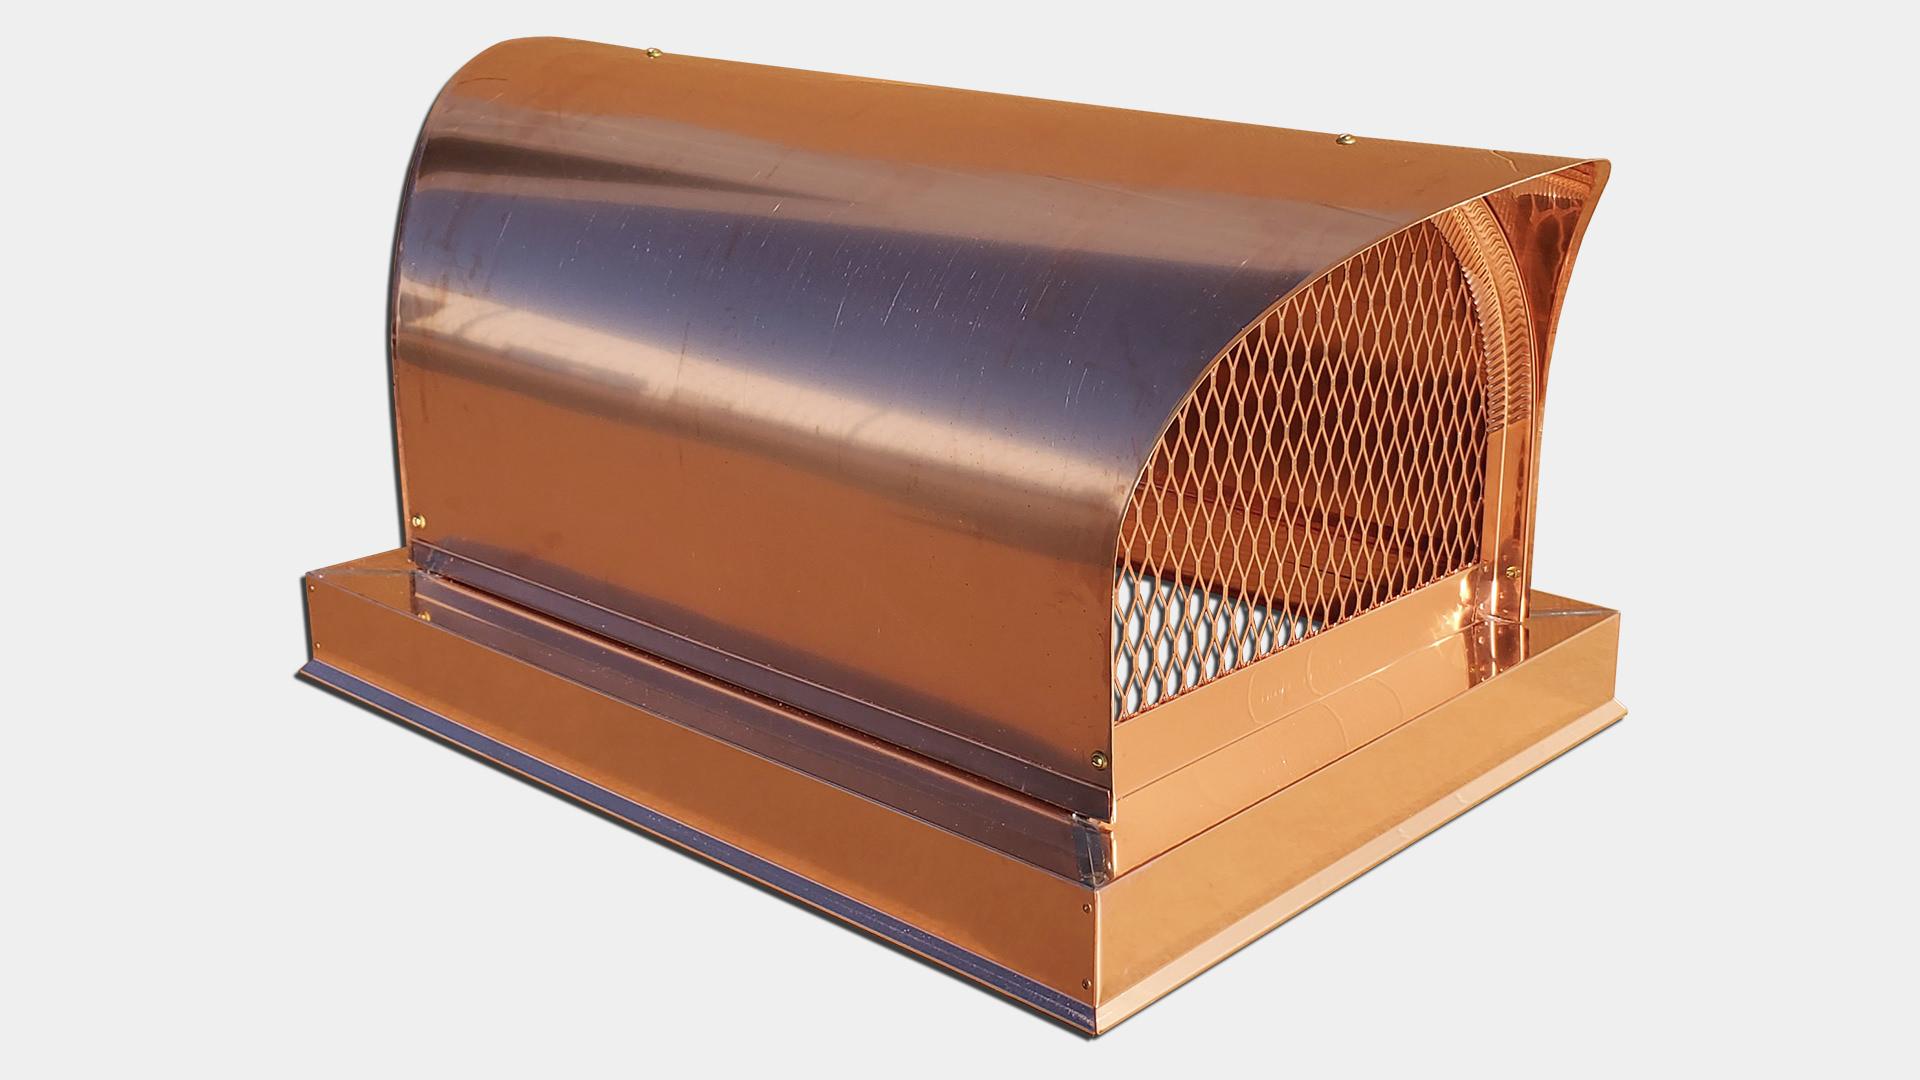 CC105 - Decorative Covered wagon round roof multi flue chimney cap copper